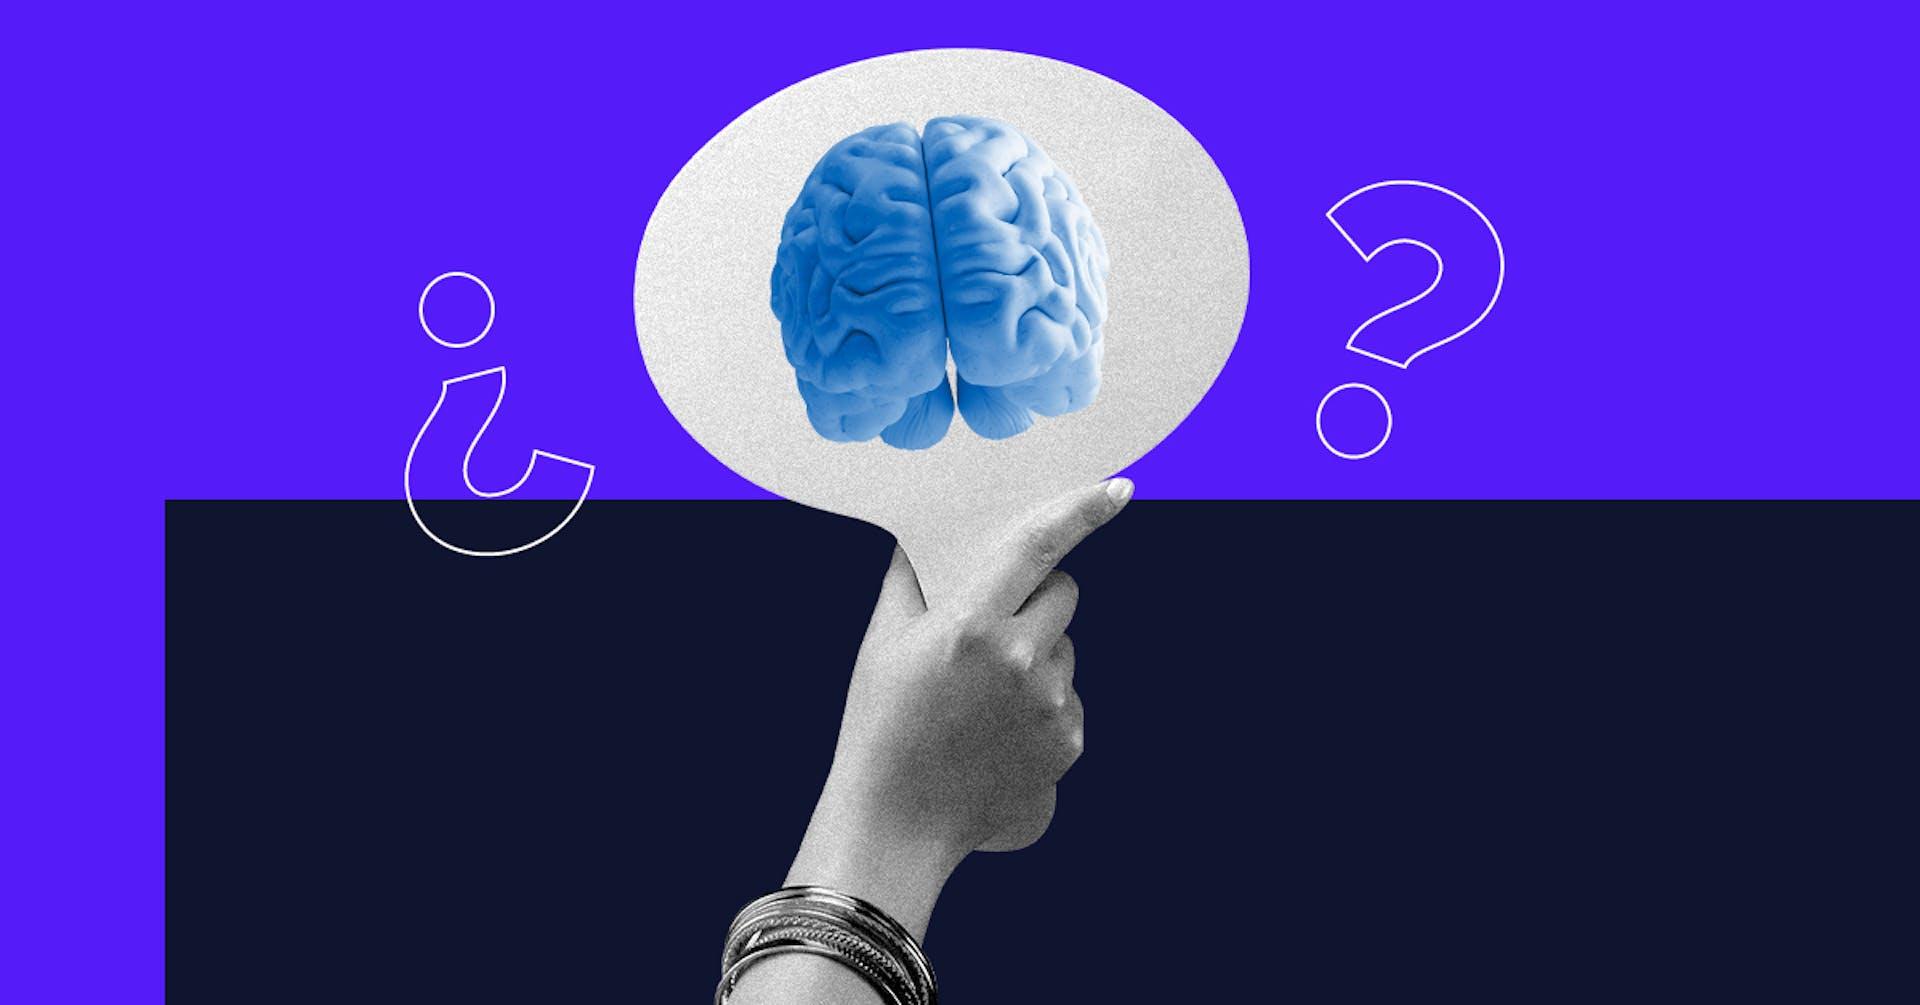 O que é e para que se usa o pensamento crítico?